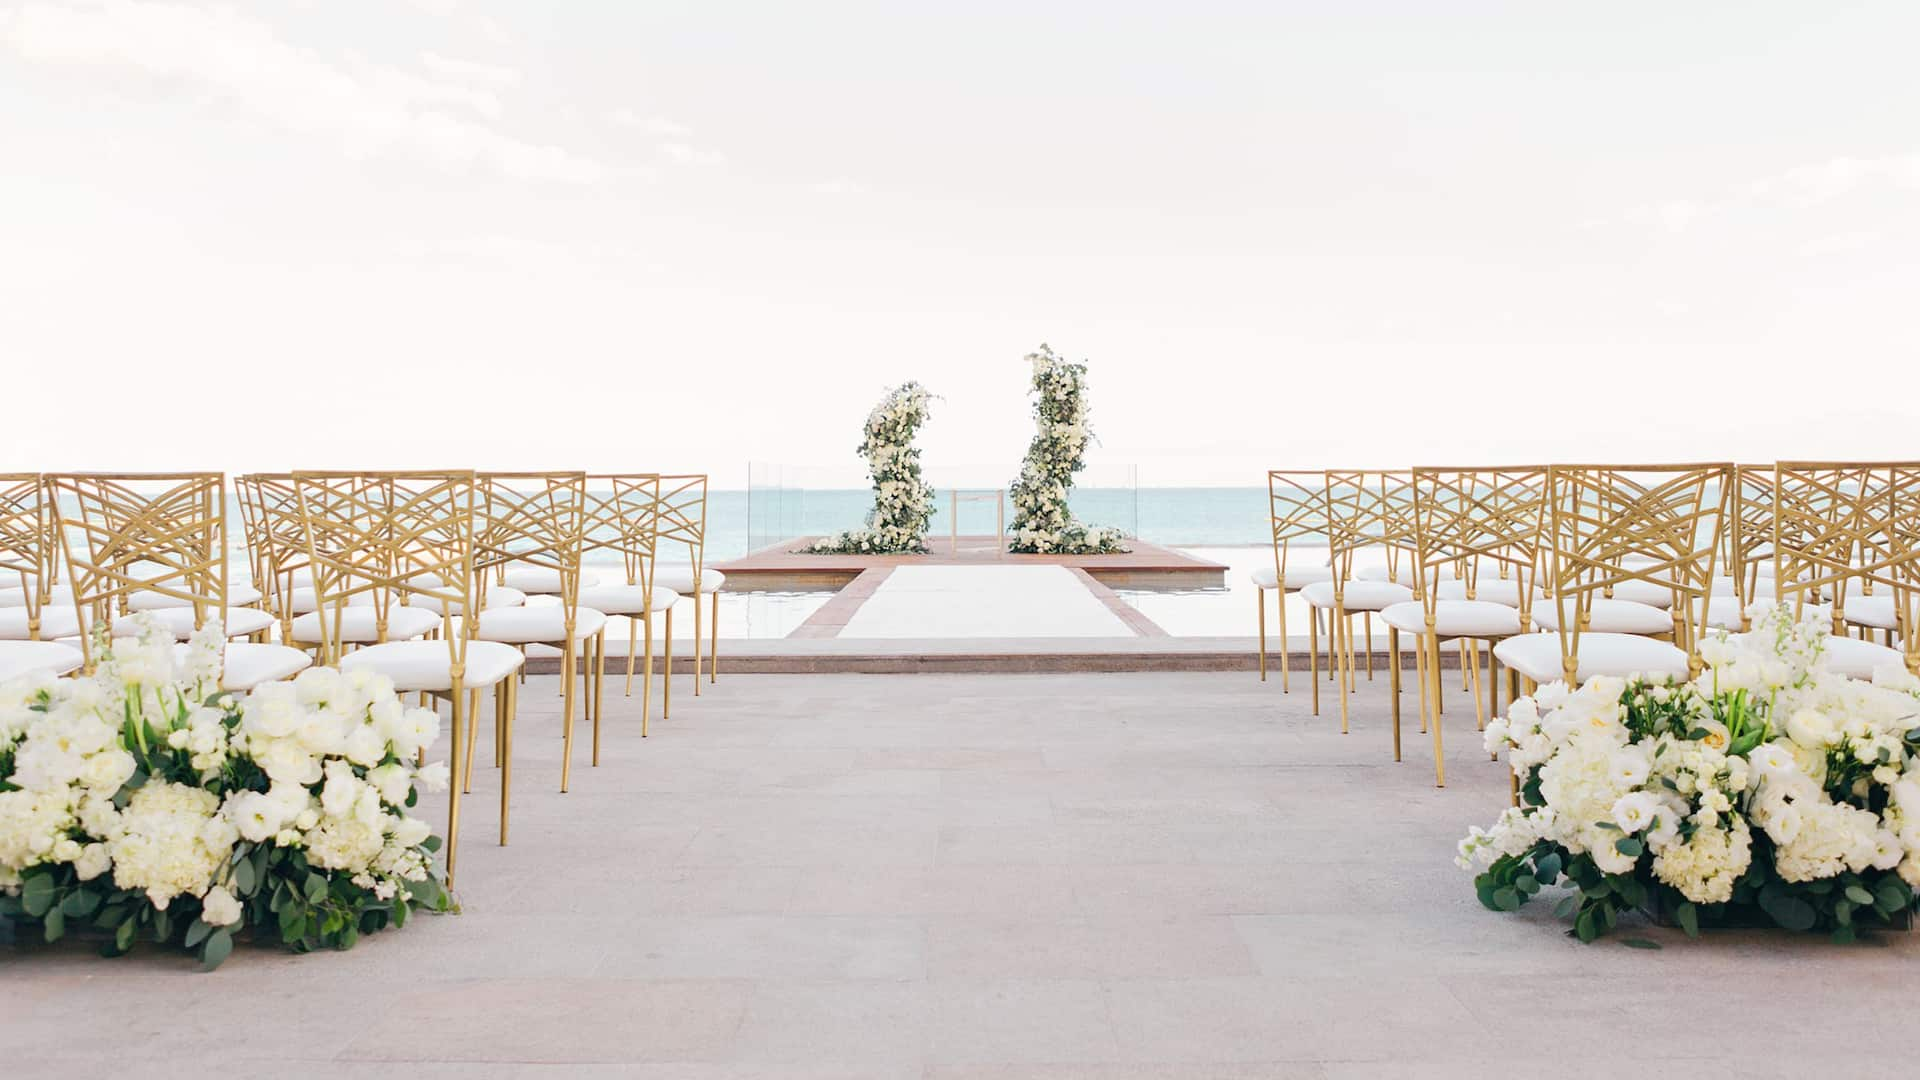 CUNPC_P579 Wedding Ceremony Set